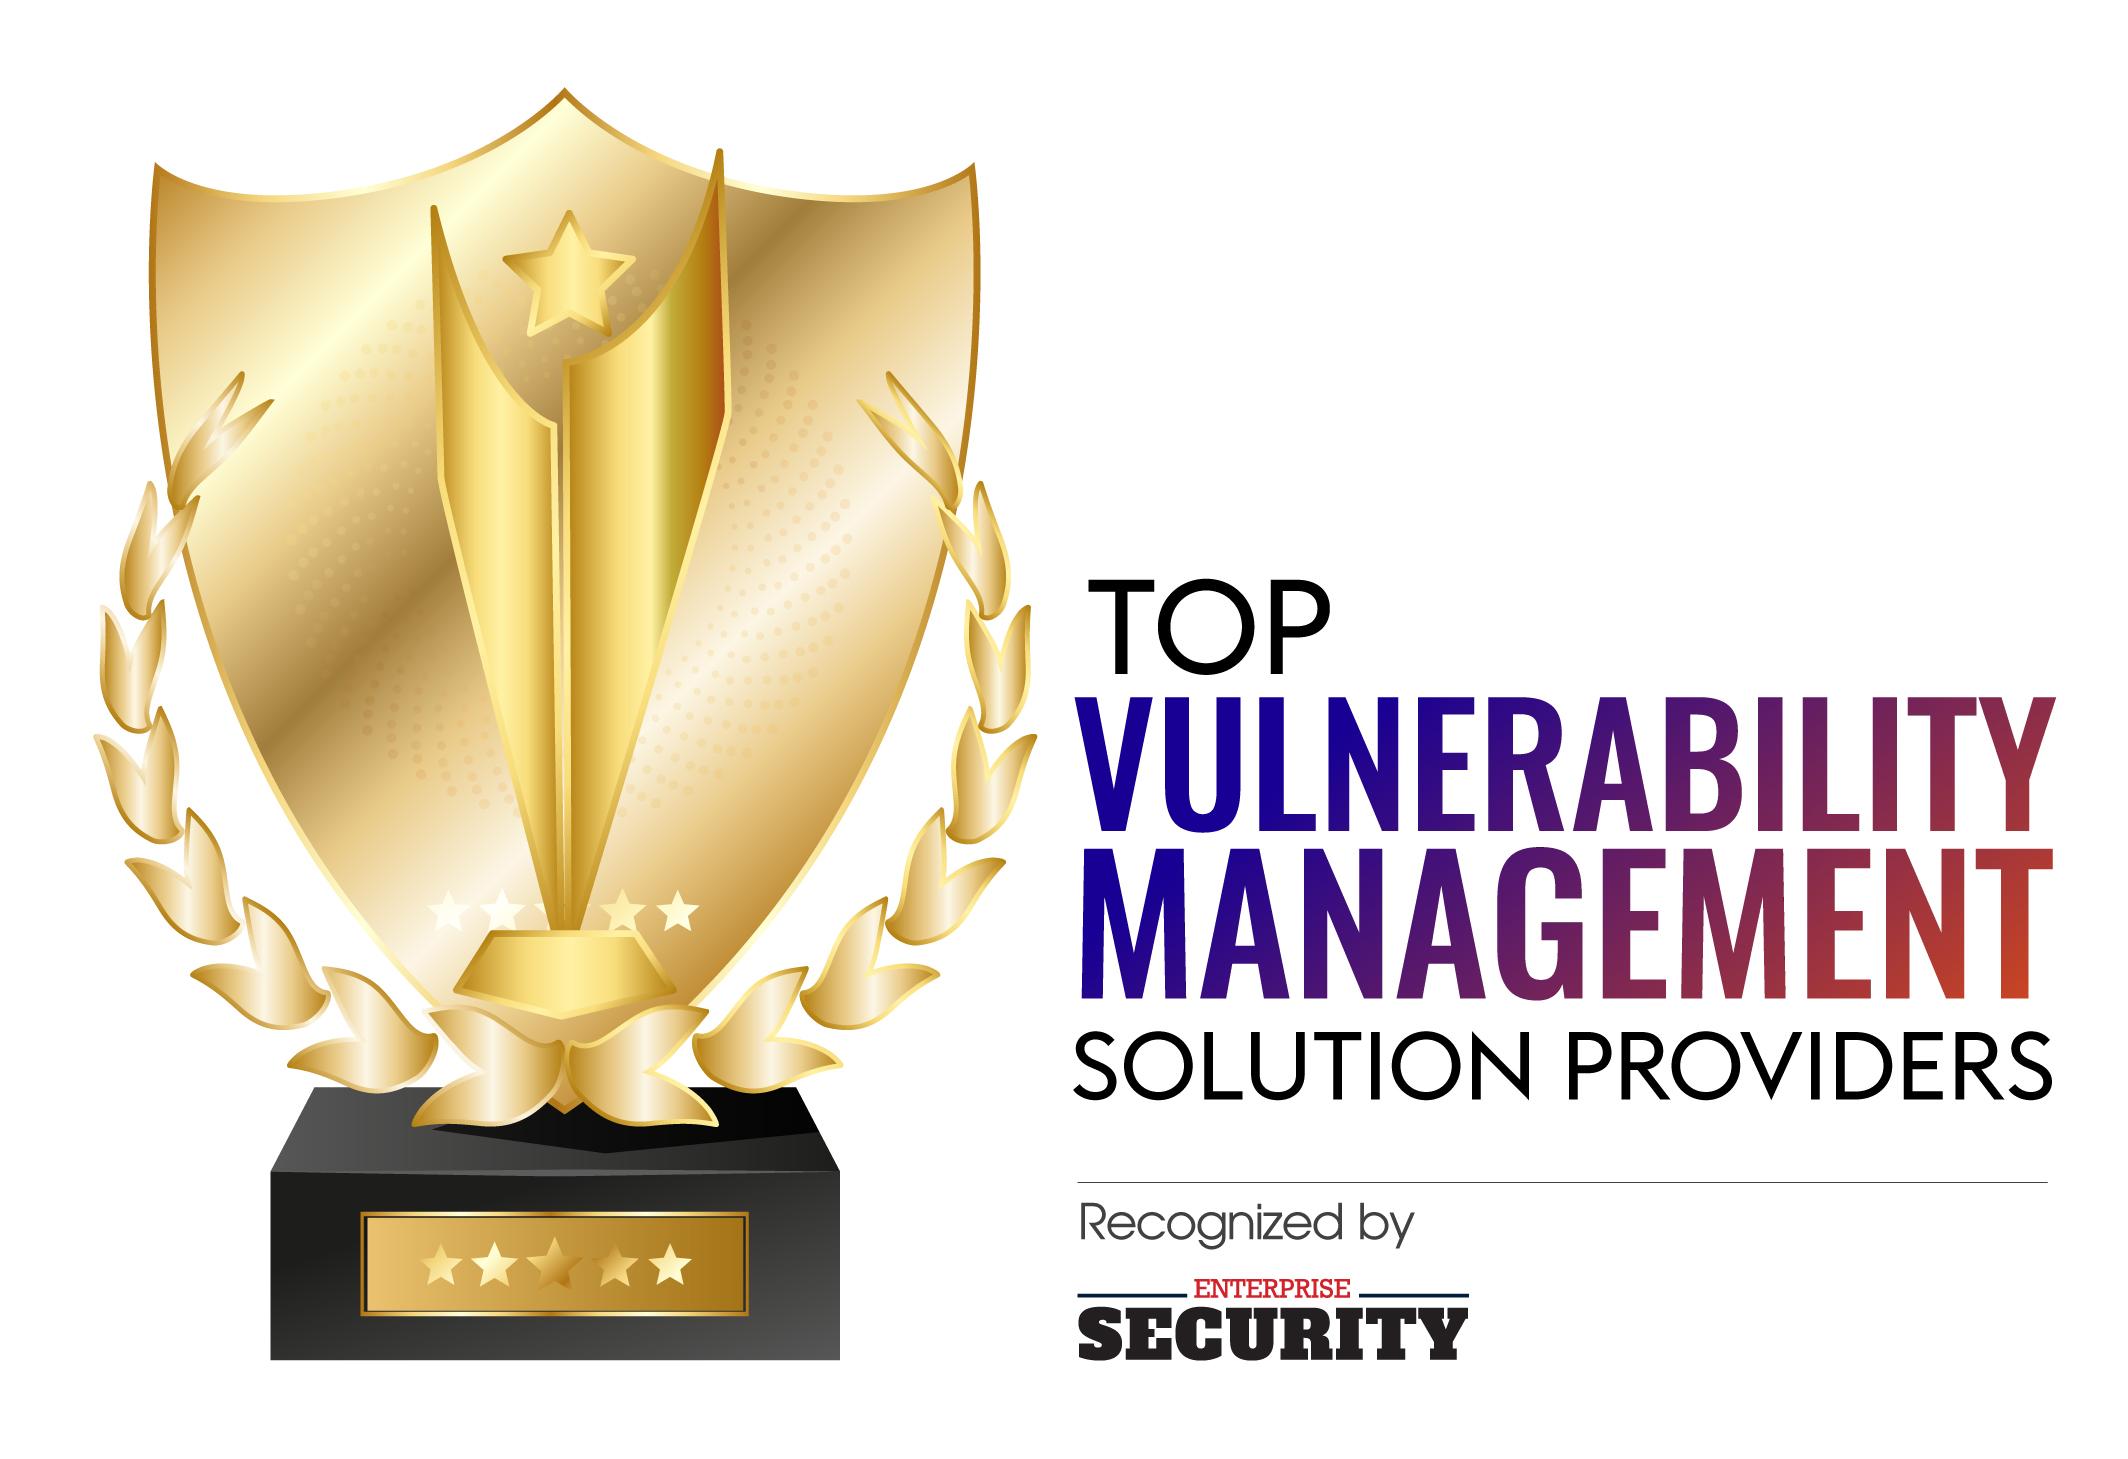 Top Vulnerability Management Solution Companies